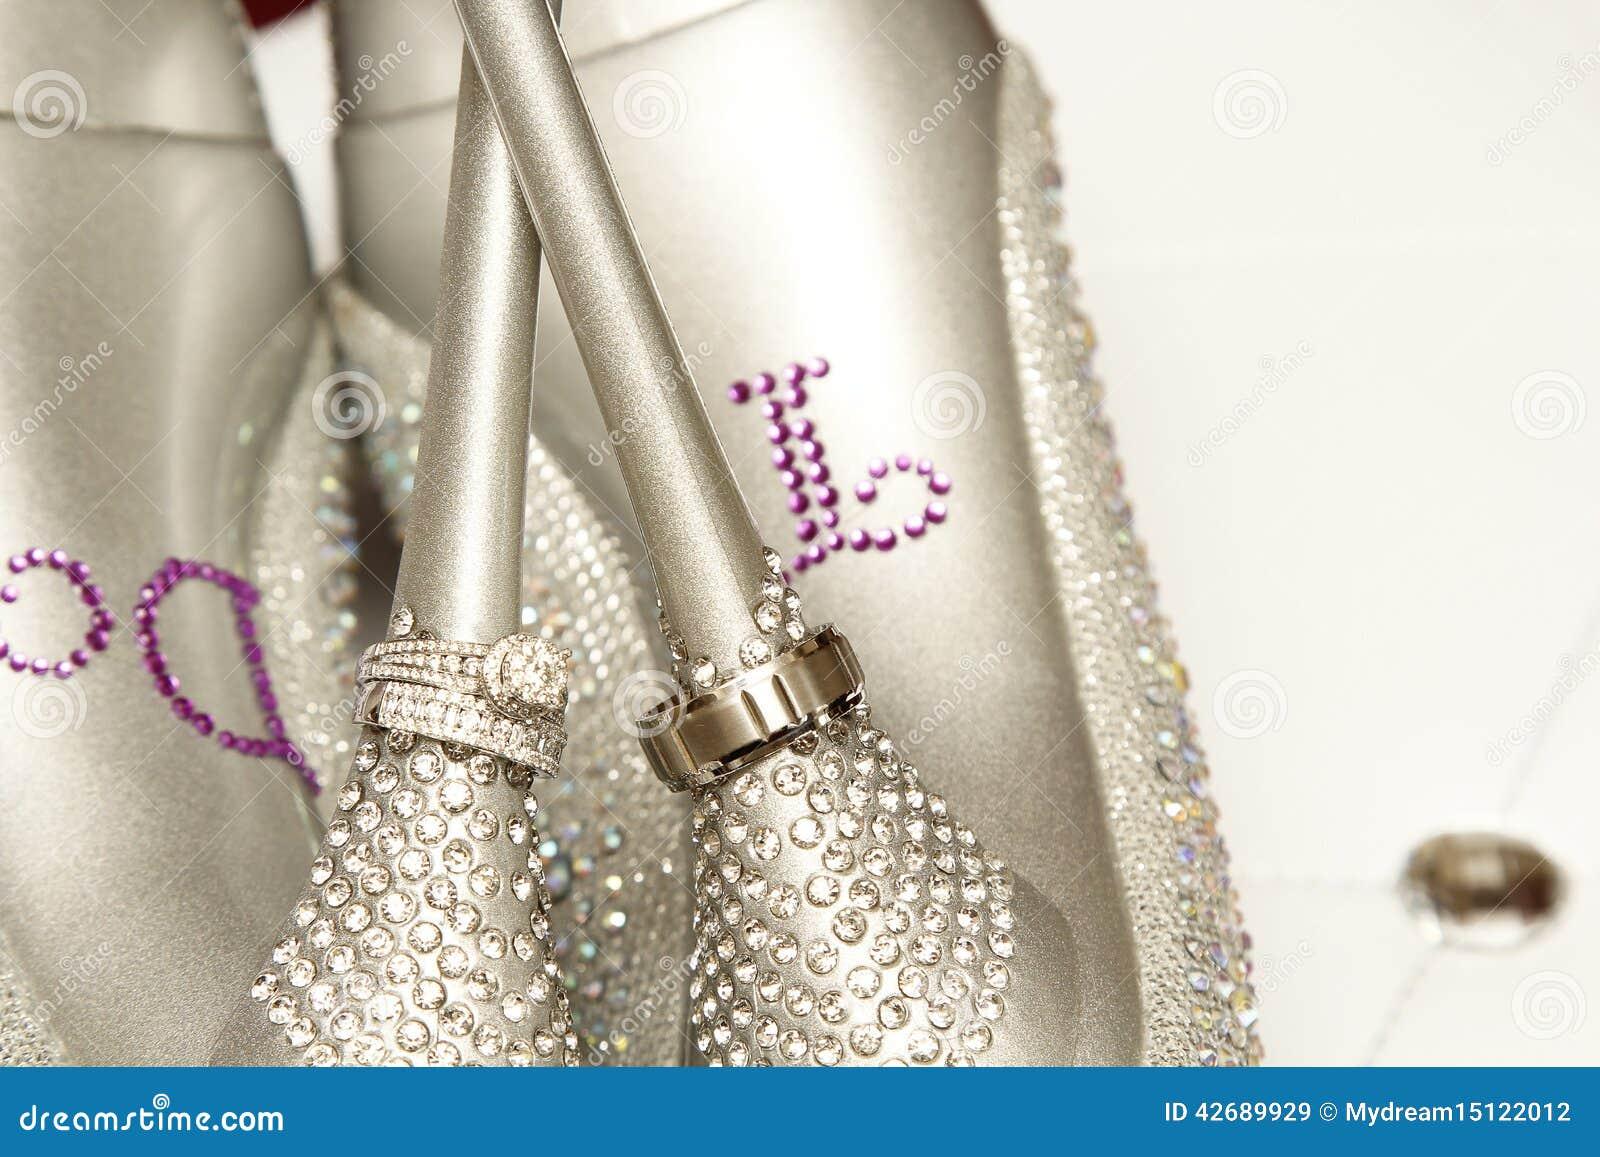 Wedding Rings With Wedding Shoes Stock Photo  Image 42689929. Palladium Wedding Rings. Sincerely Jules Wedding Rings. Mason Jar Rings. Light Engagement Rings. Beauty Wedding Rings. Antique Onyx Engagement Wedding Rings. Cursive Name Wedding Rings. Shoe Engagement Rings